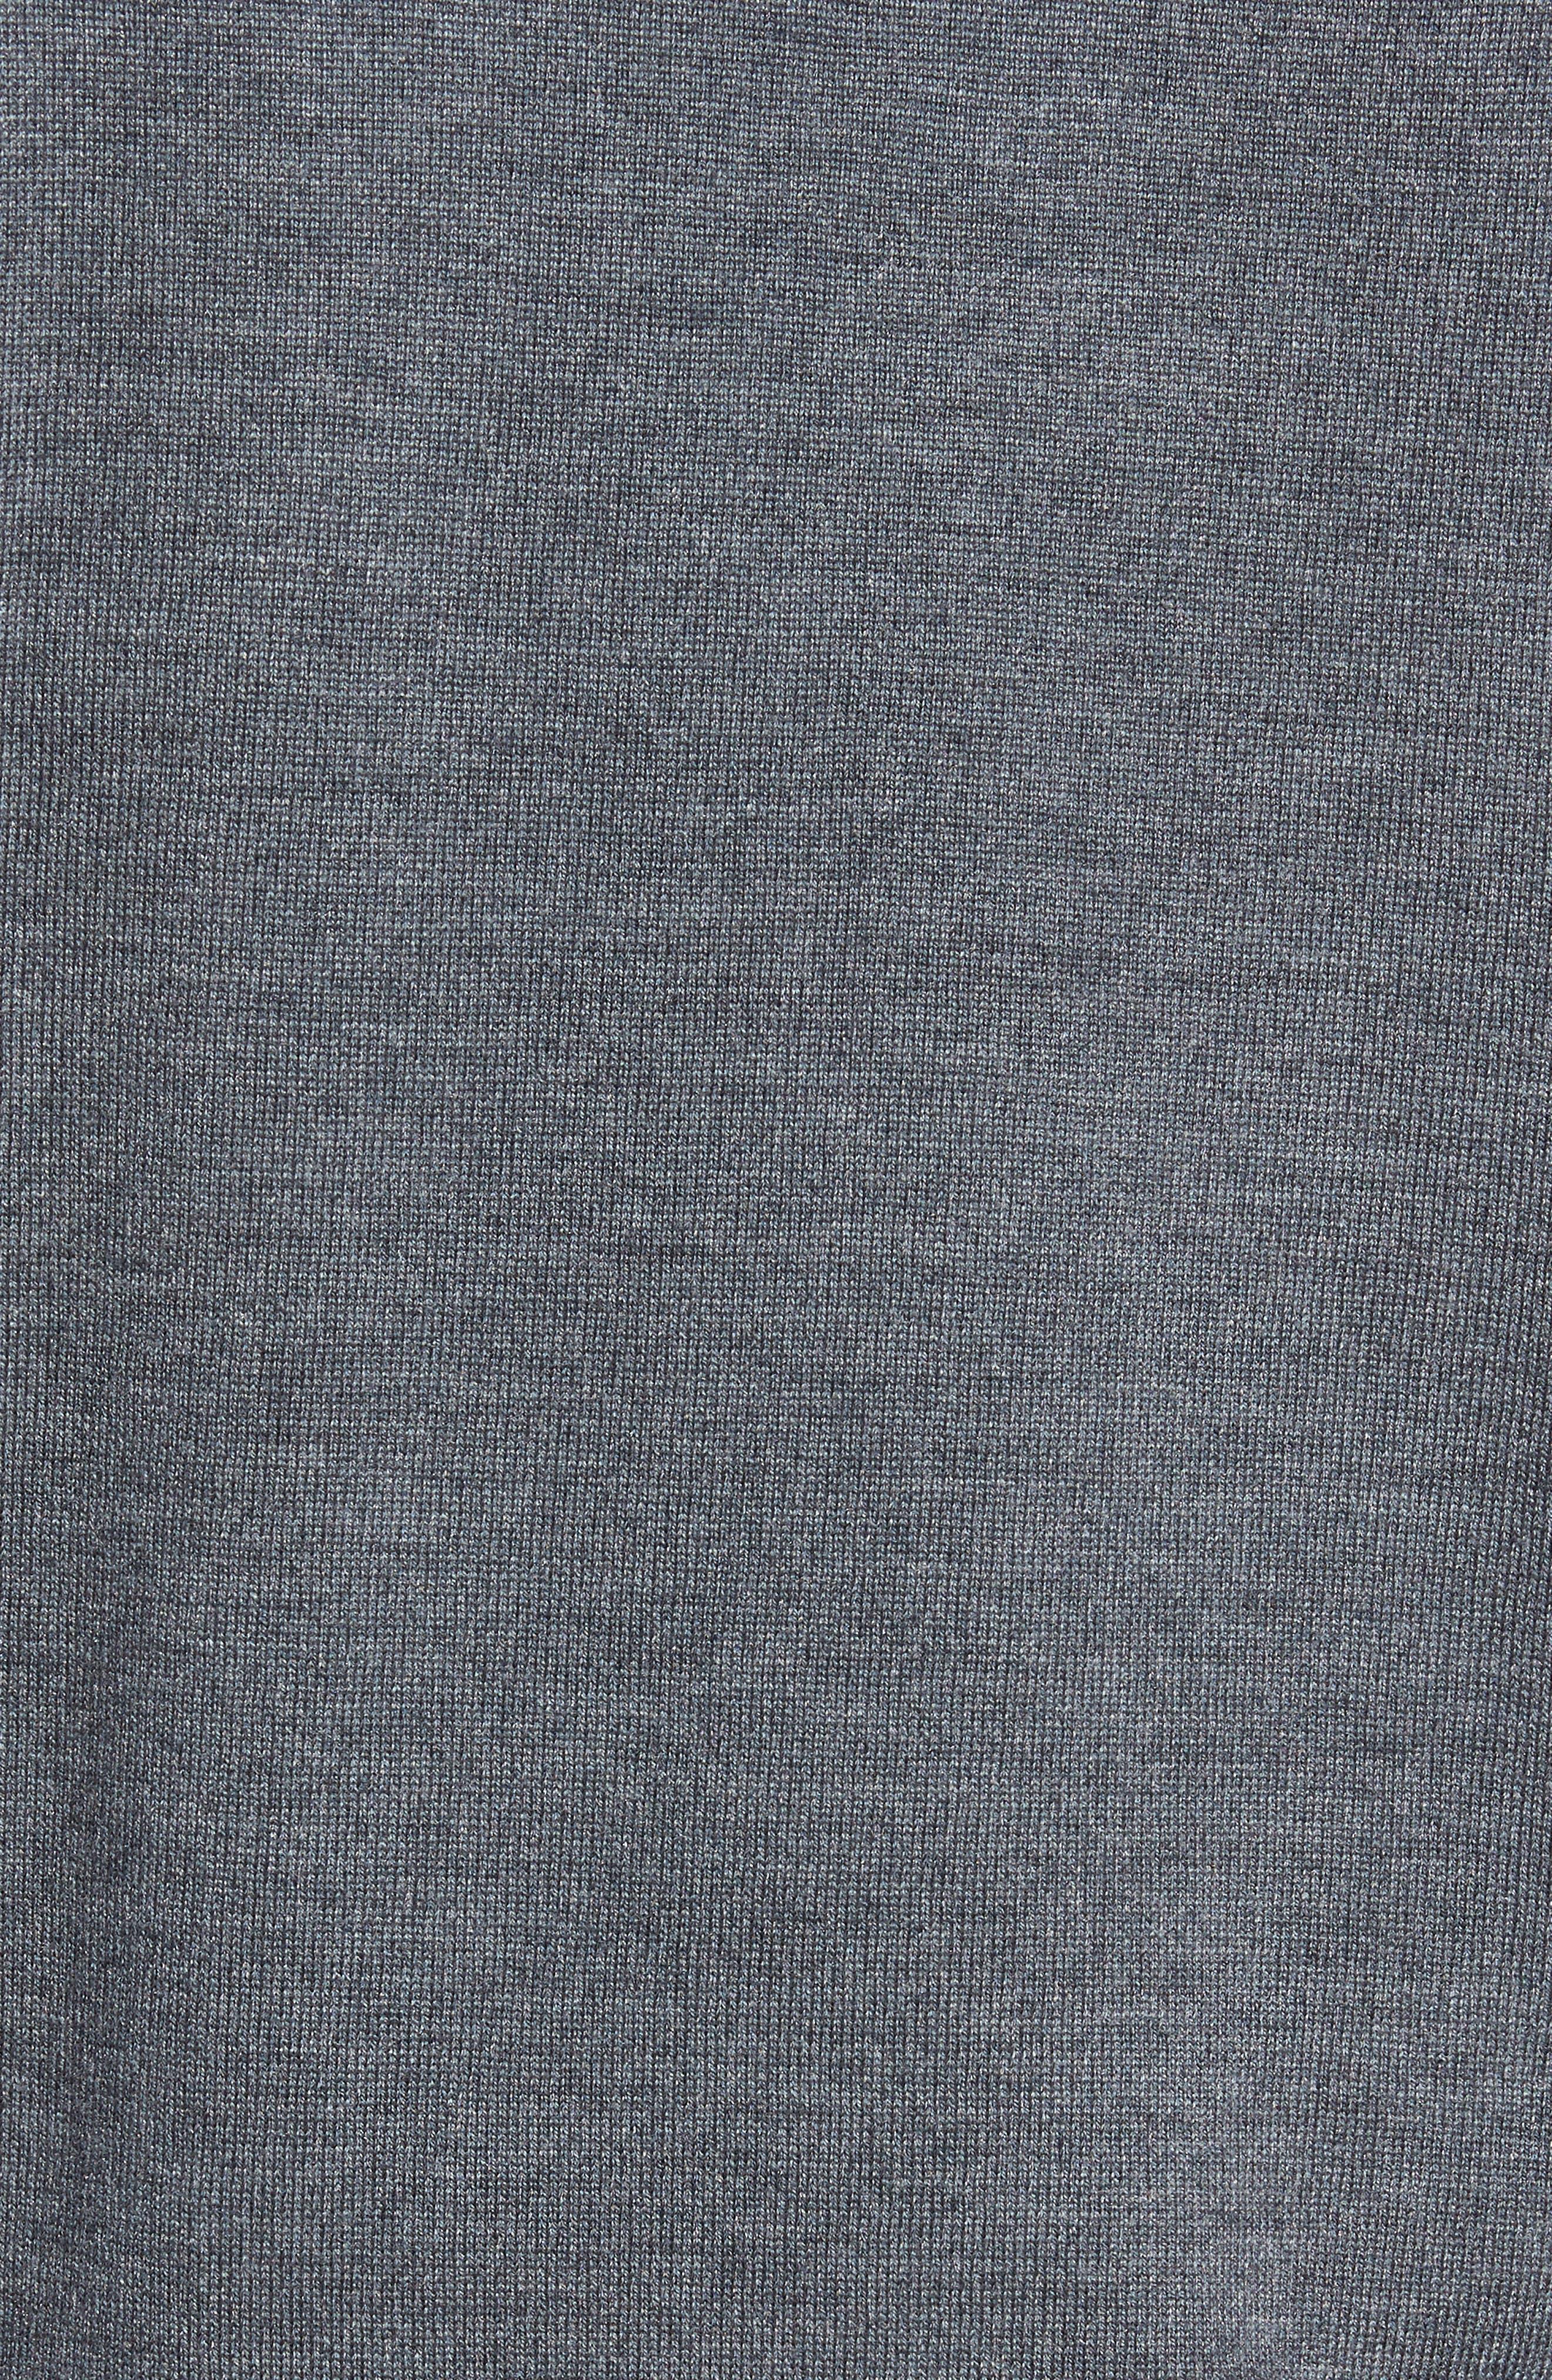 Crown Merino Blend Knit Vest,                             Alternate thumbnail 5, color,                             Charcoal